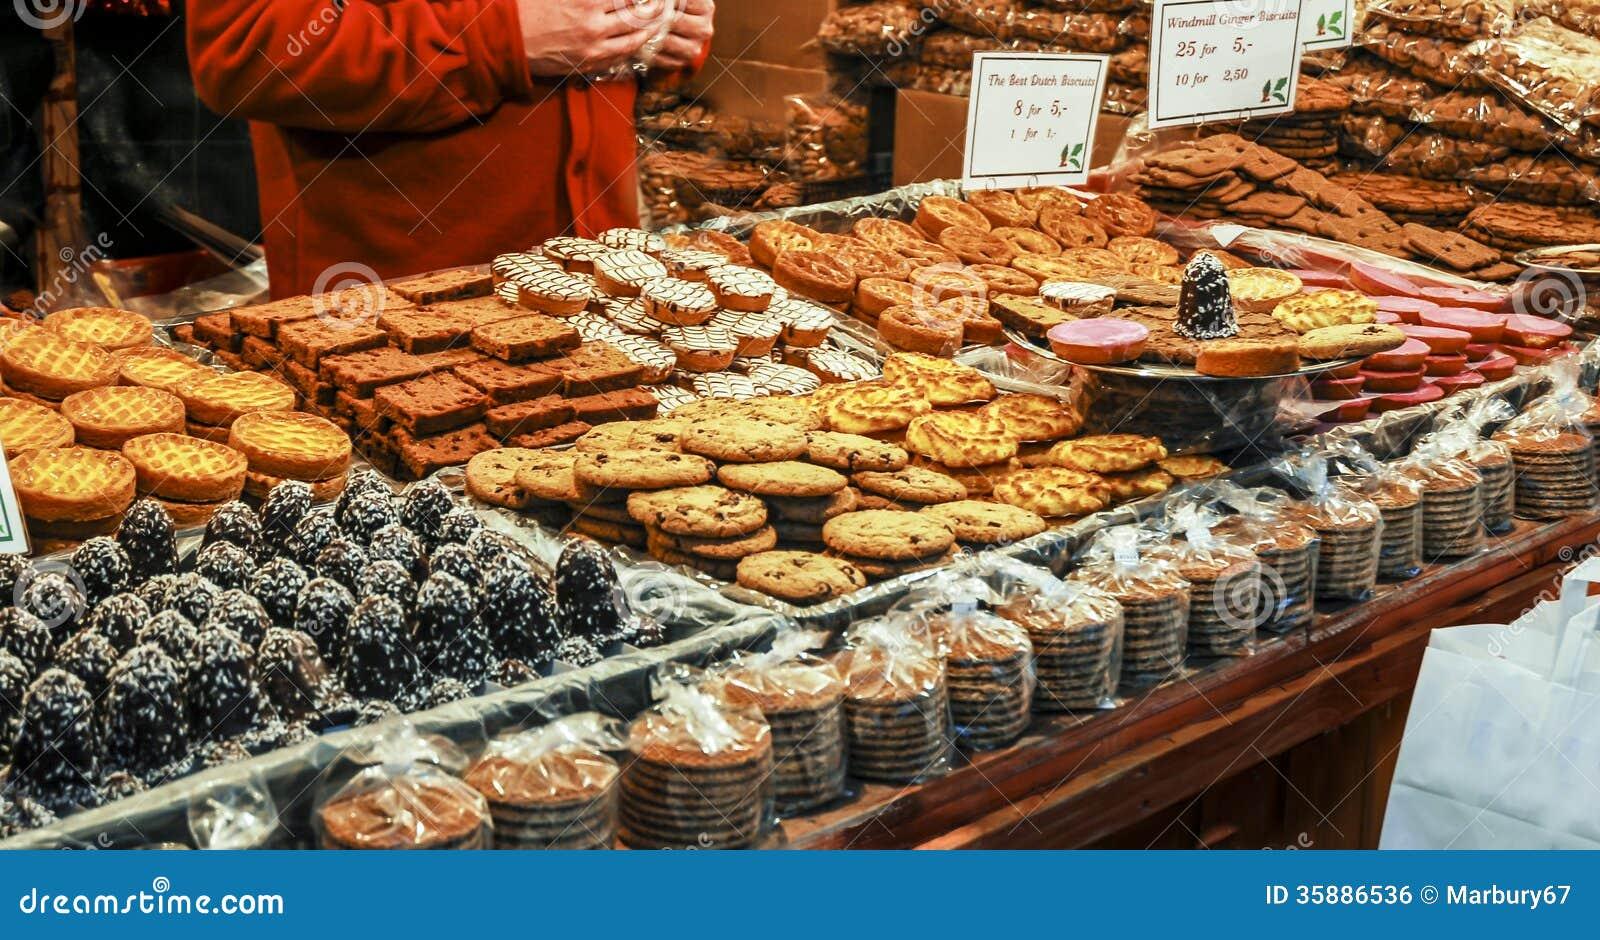 German Christmas Market Food Stalls